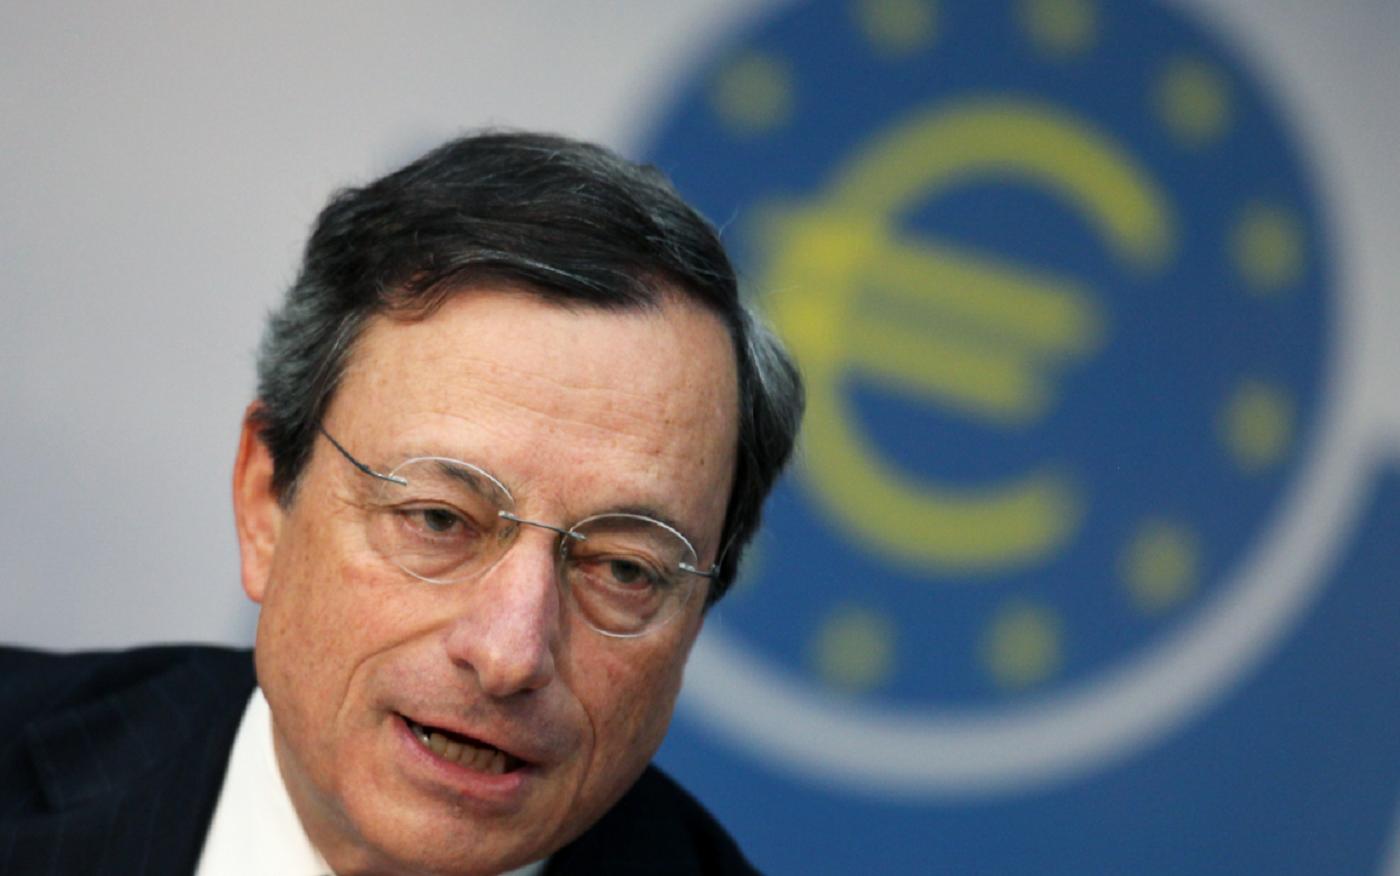 Mario Draghi, Presidente della Banca centrale europea